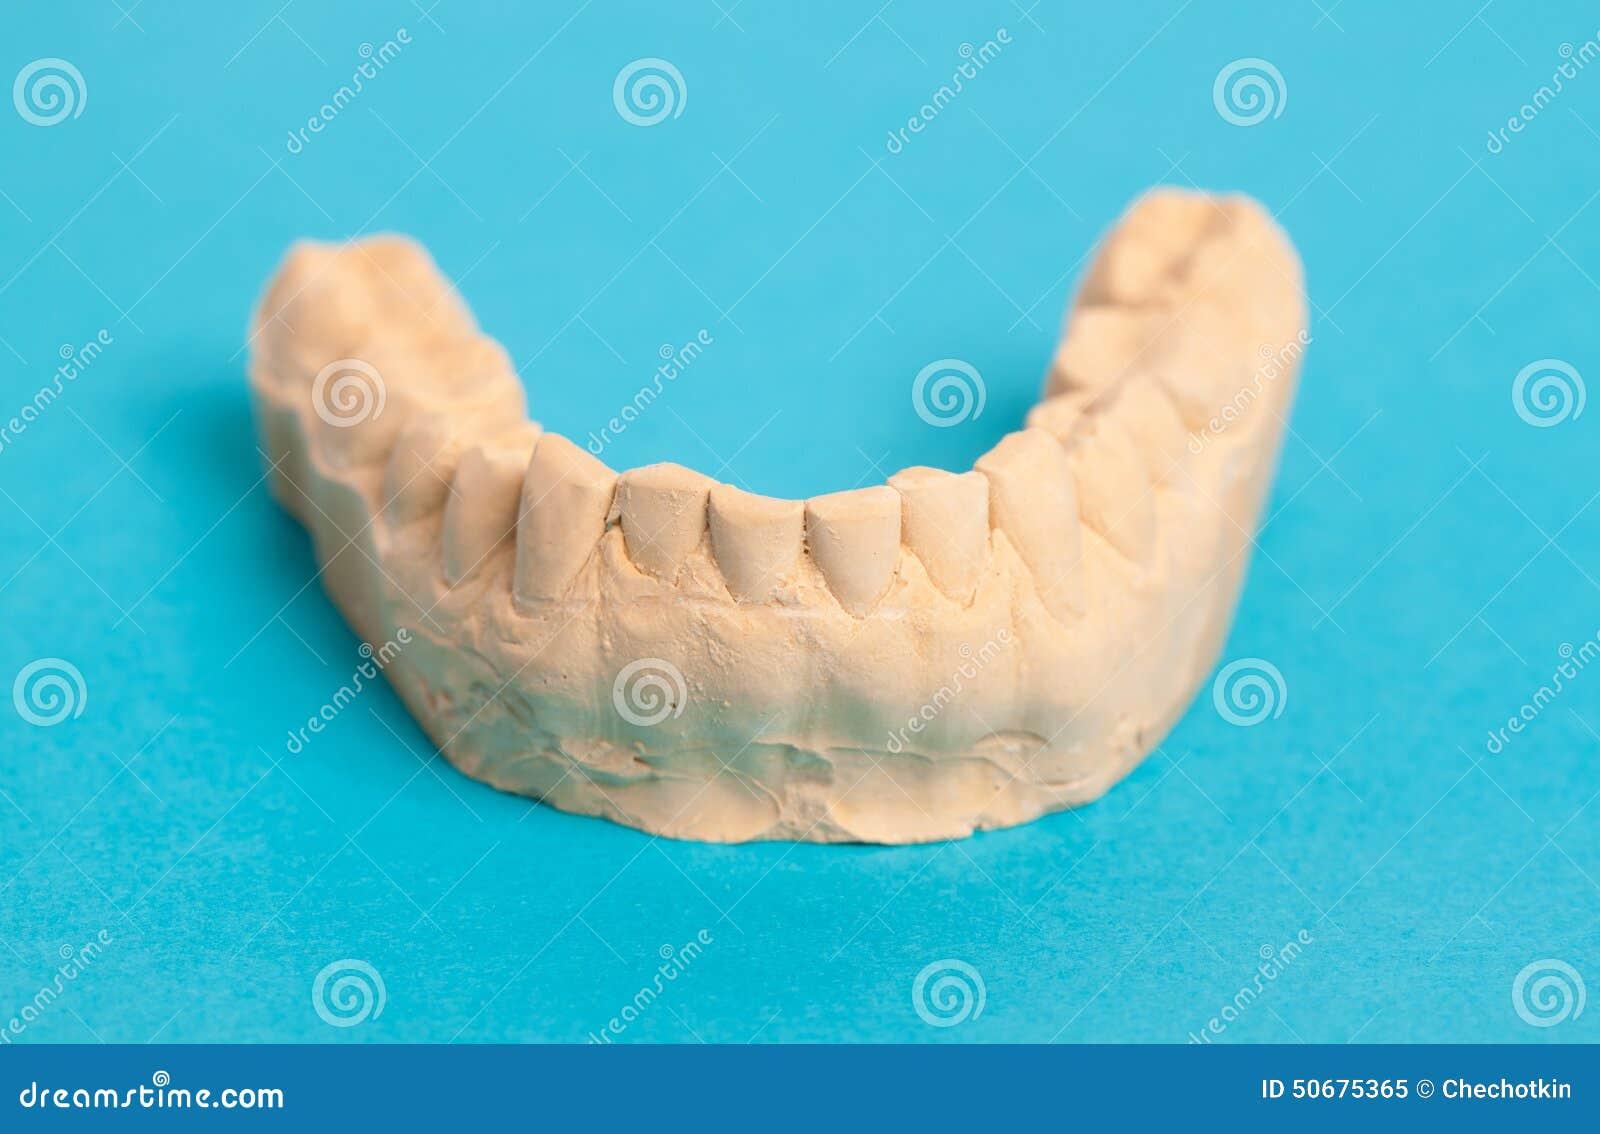 Download 义肢下颌 库存图片. 图片 包括有 关心, 设计, 下颌, 背包, 女主持人, 膏药, 牙齿, 医学, 骨头的 - 50675365